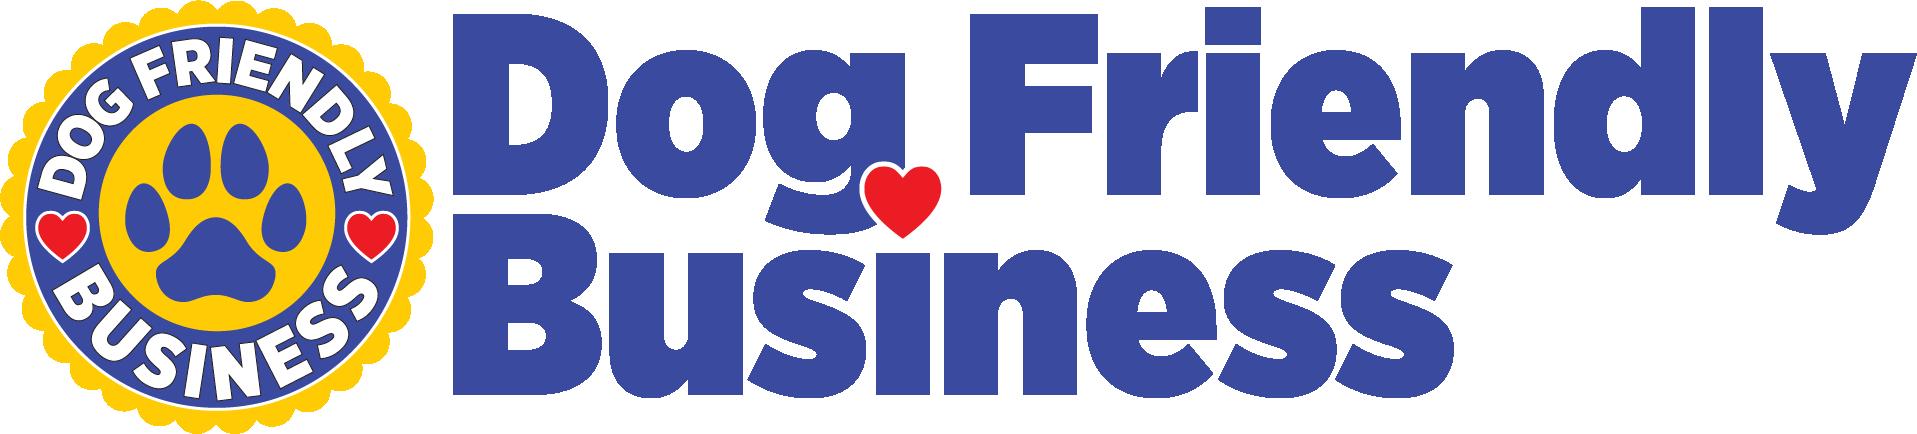 Dog Friendly Business